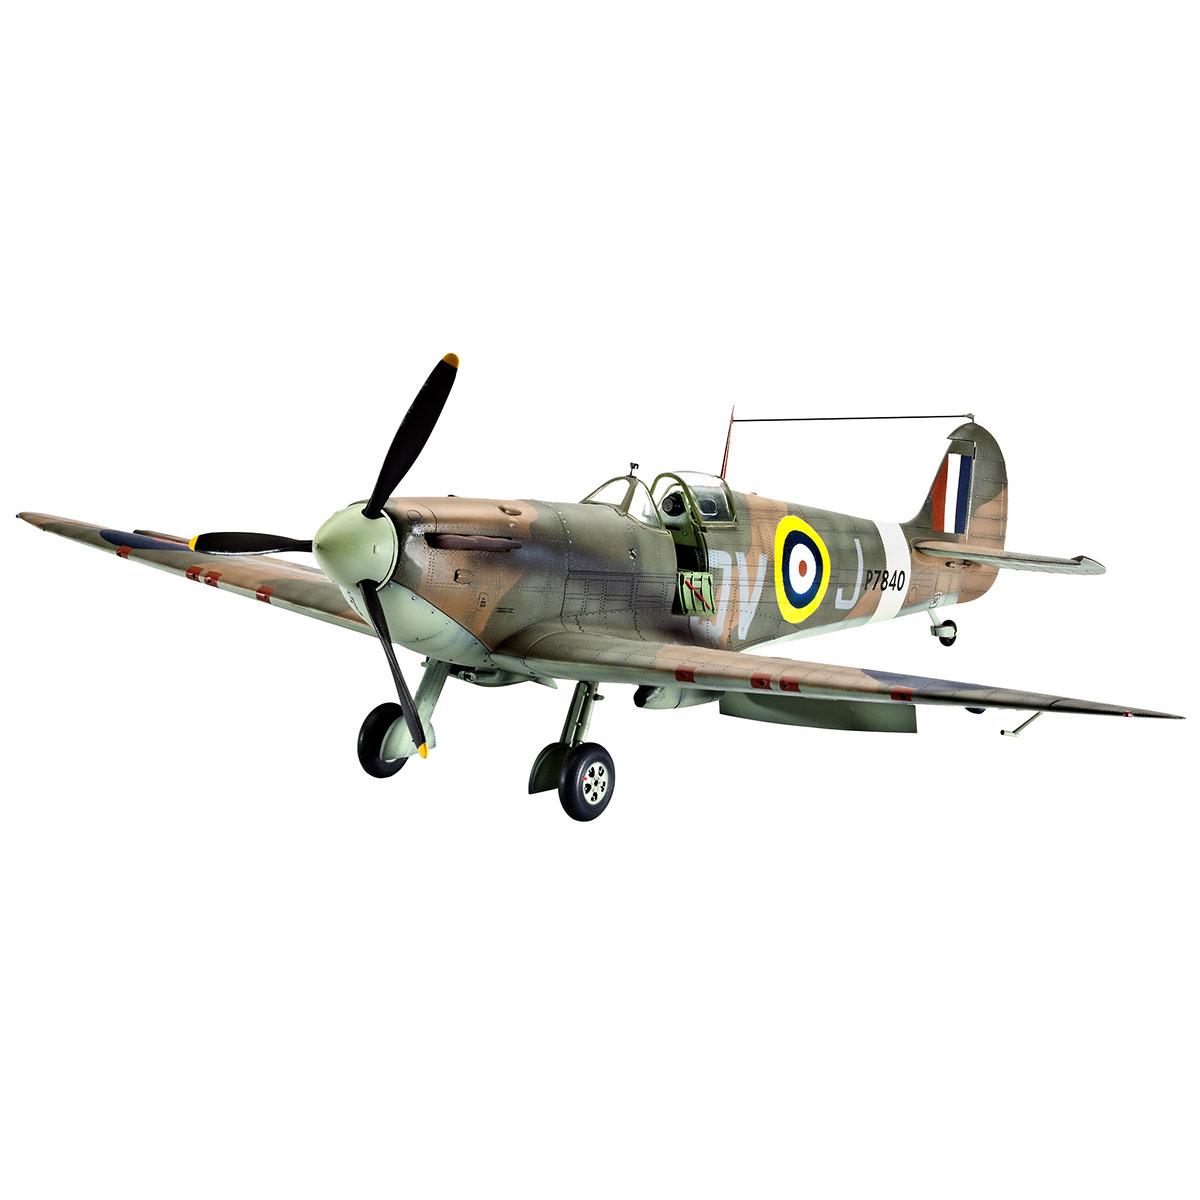 Maquette - Spitfire - 1/32